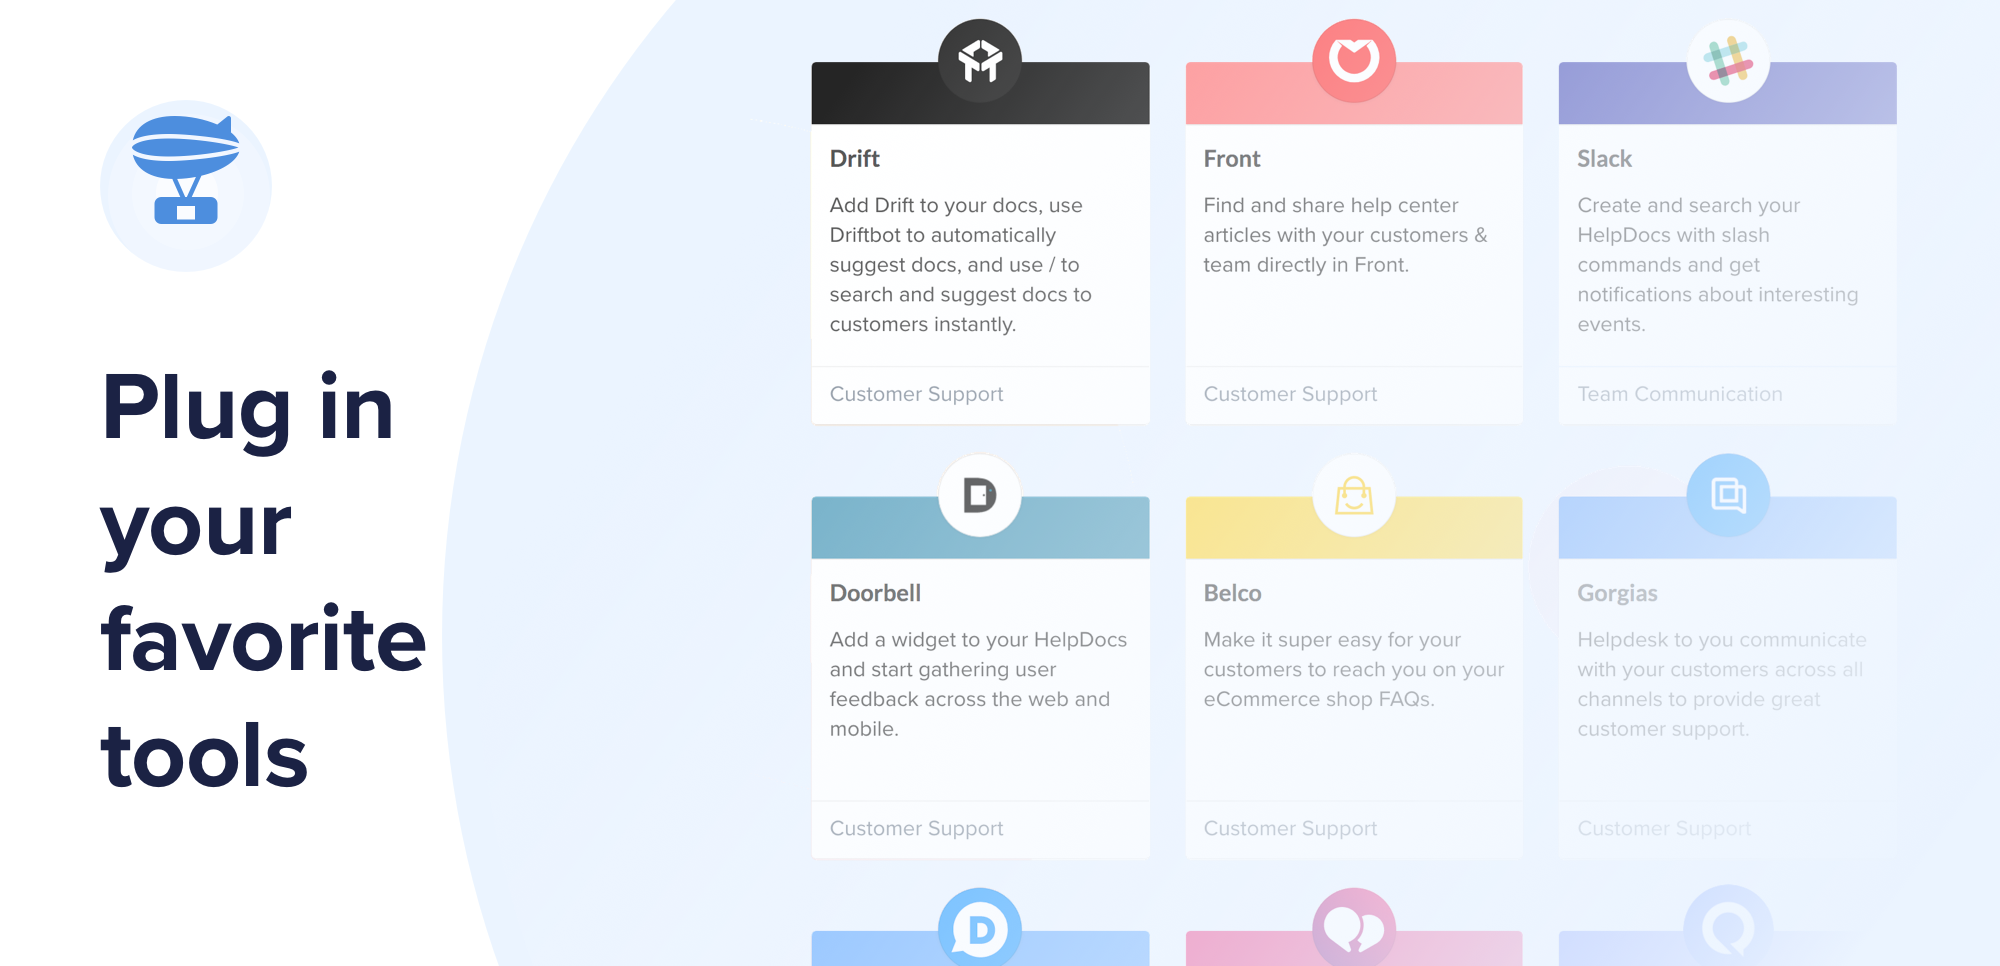 HelpDocs Demo - Plug in your favorite tools